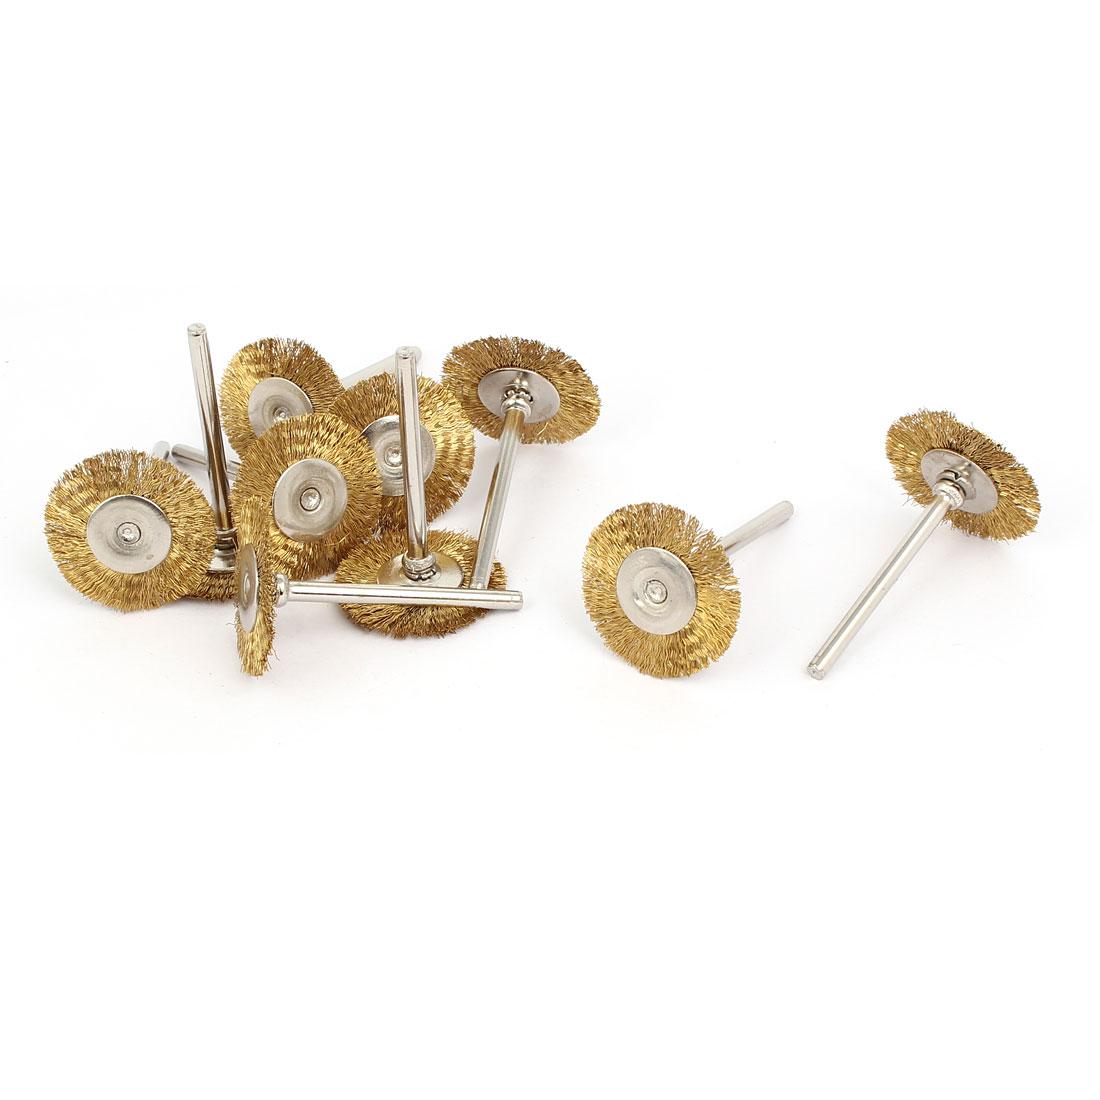 3mm Shank 25mm Head Dia Brass Wire Polishing Brush Wheel Buffing Tool 10pcs